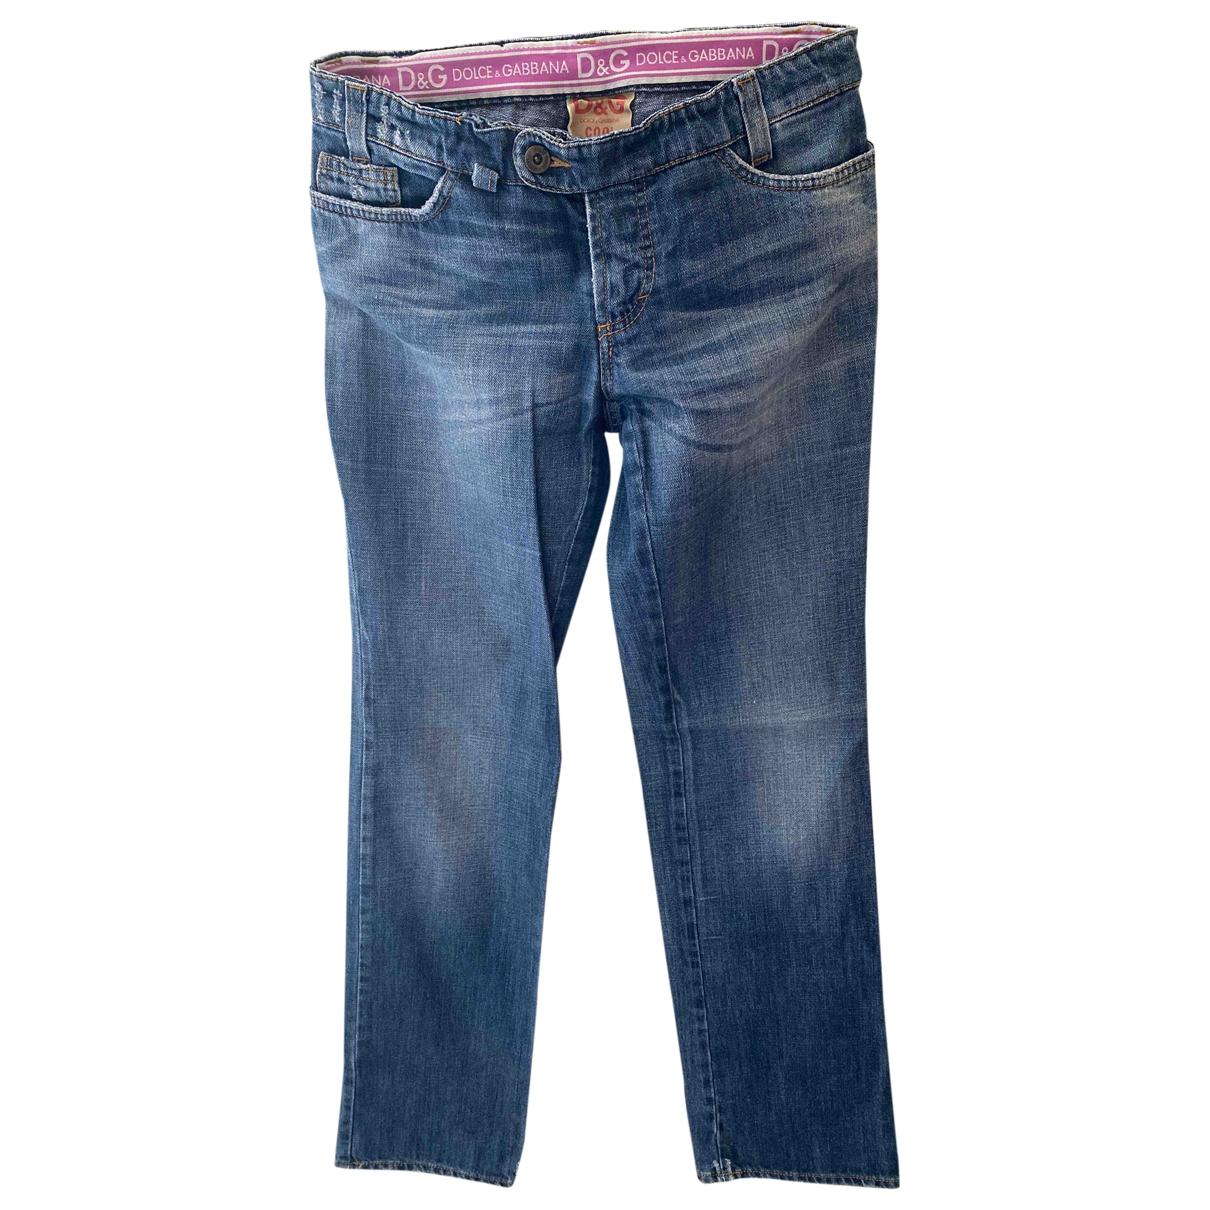 D&g \N Blue Cotton - elasthane Jeans for Women 28 US